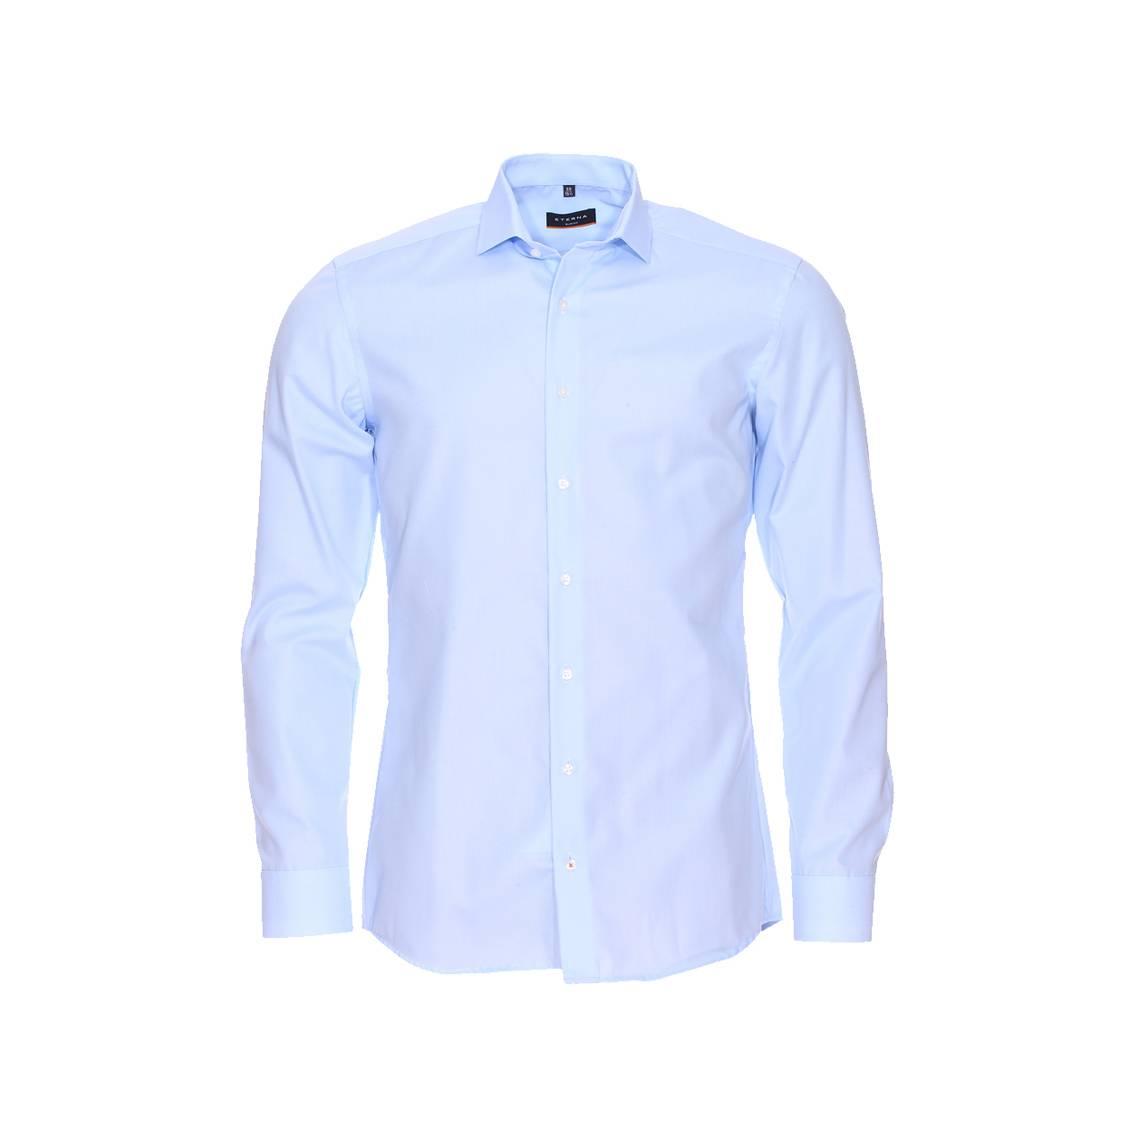 chemise ajust e eterna en popeline bleu ciel sans repassage rue des hommes. Black Bedroom Furniture Sets. Home Design Ideas